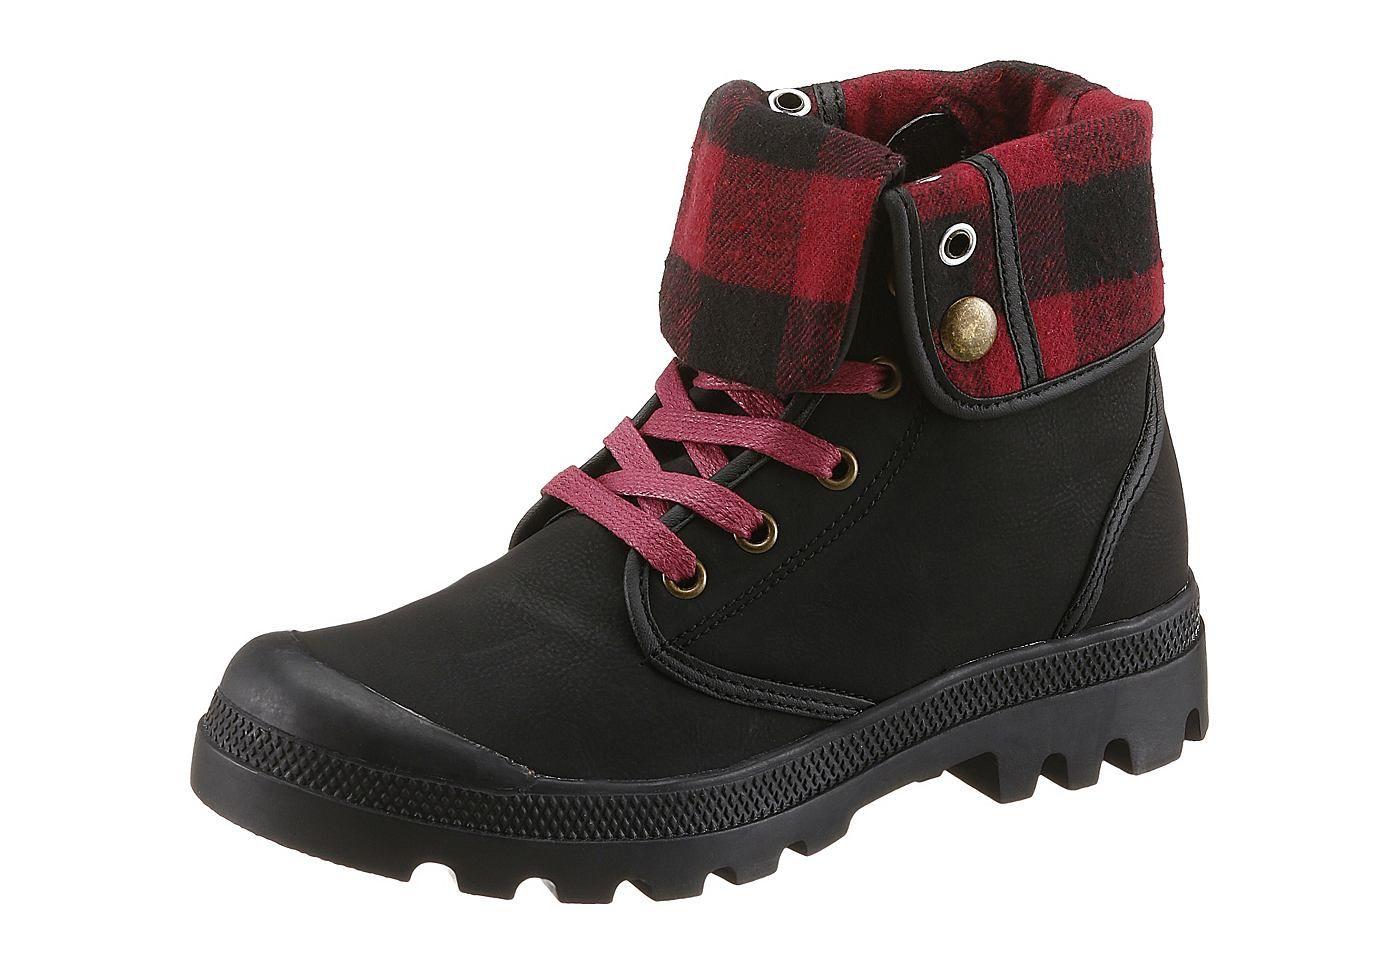 Arizona Boots aus Lederimitat, Futter: Textil, Innensohle: Textil, Laufsohle: Synthetik, Absatzhöhe: 35 mm, Plateauhöhe: 25 mm, Schuhweite: normal (Weite F), Reißverschluss....